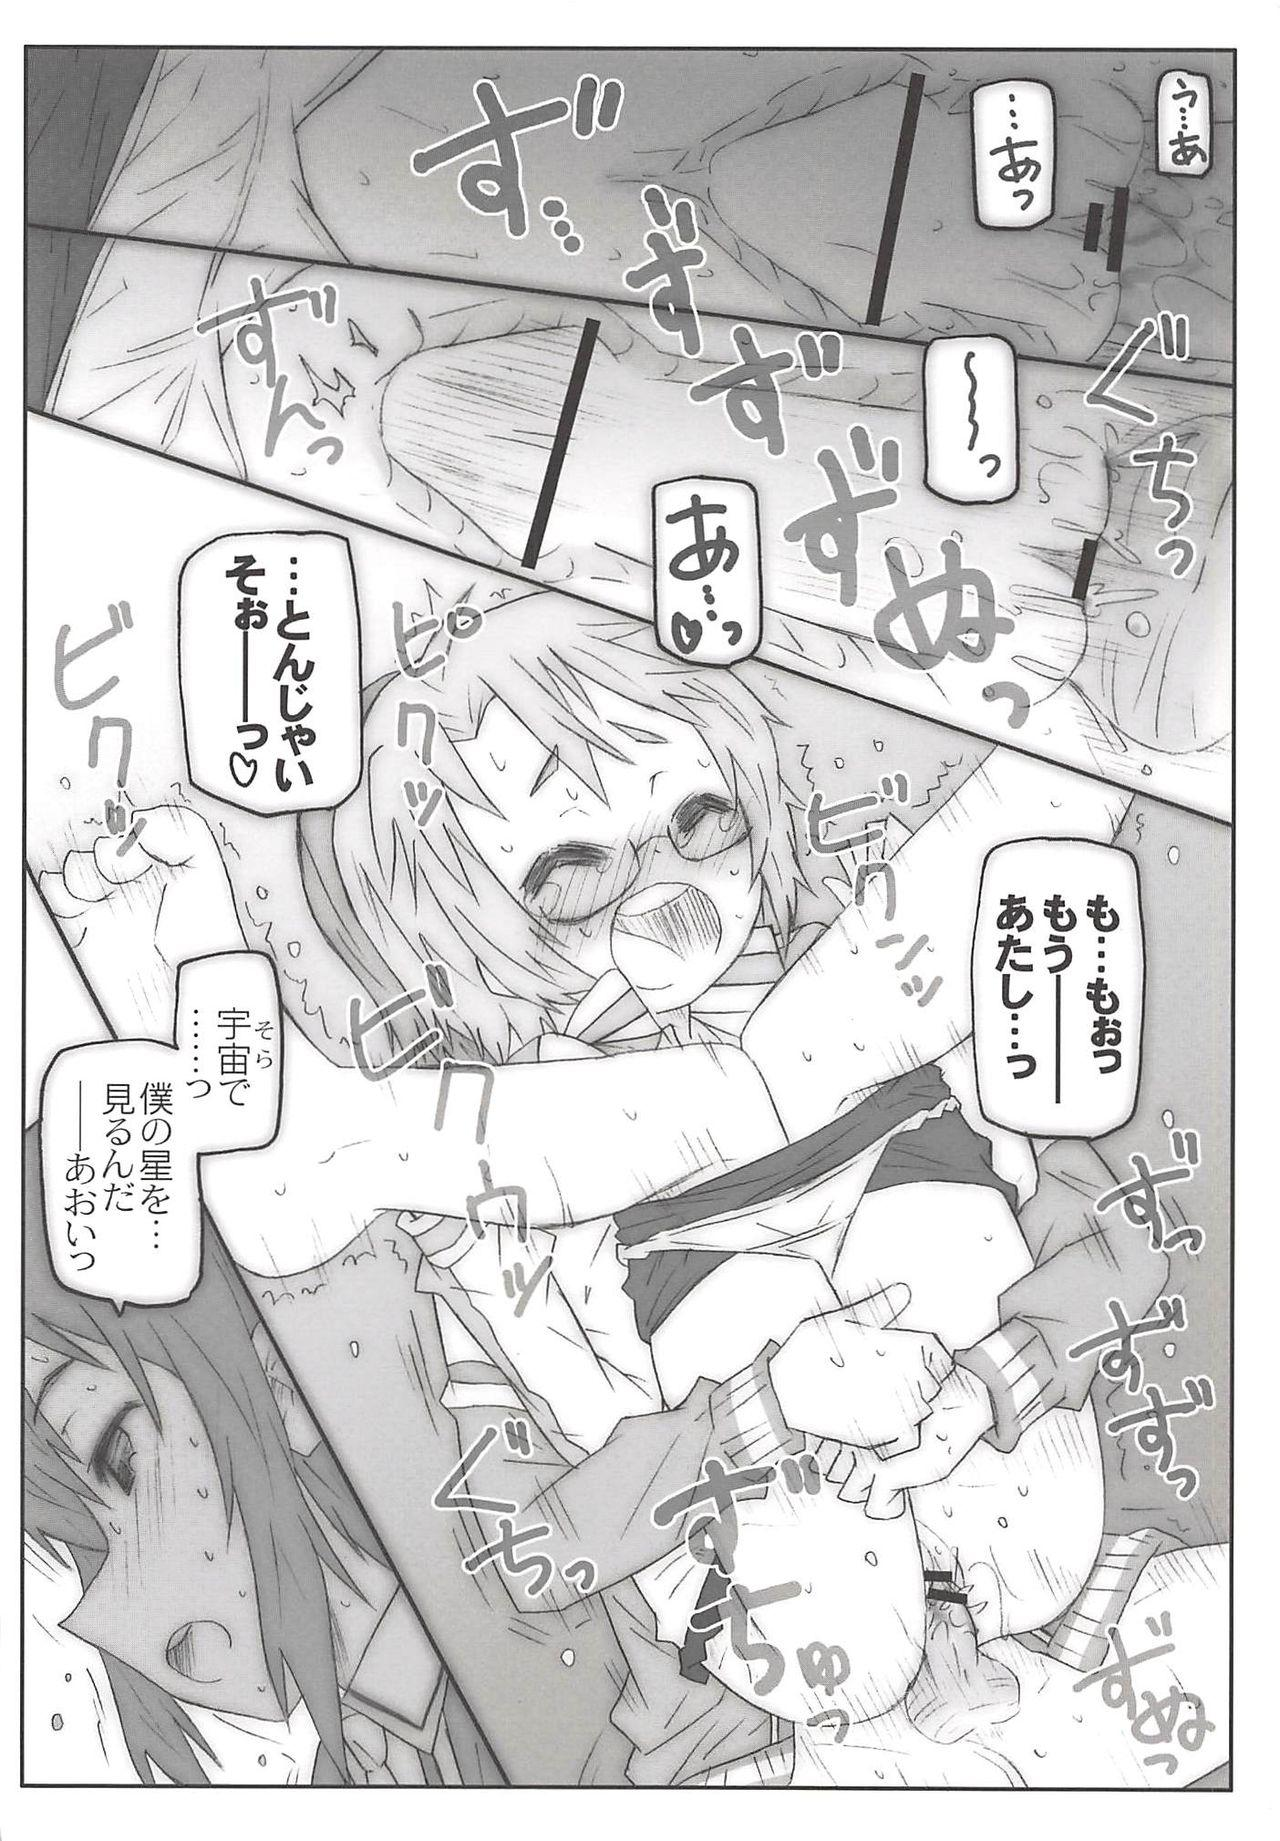 THE Mahou Shoujo 97